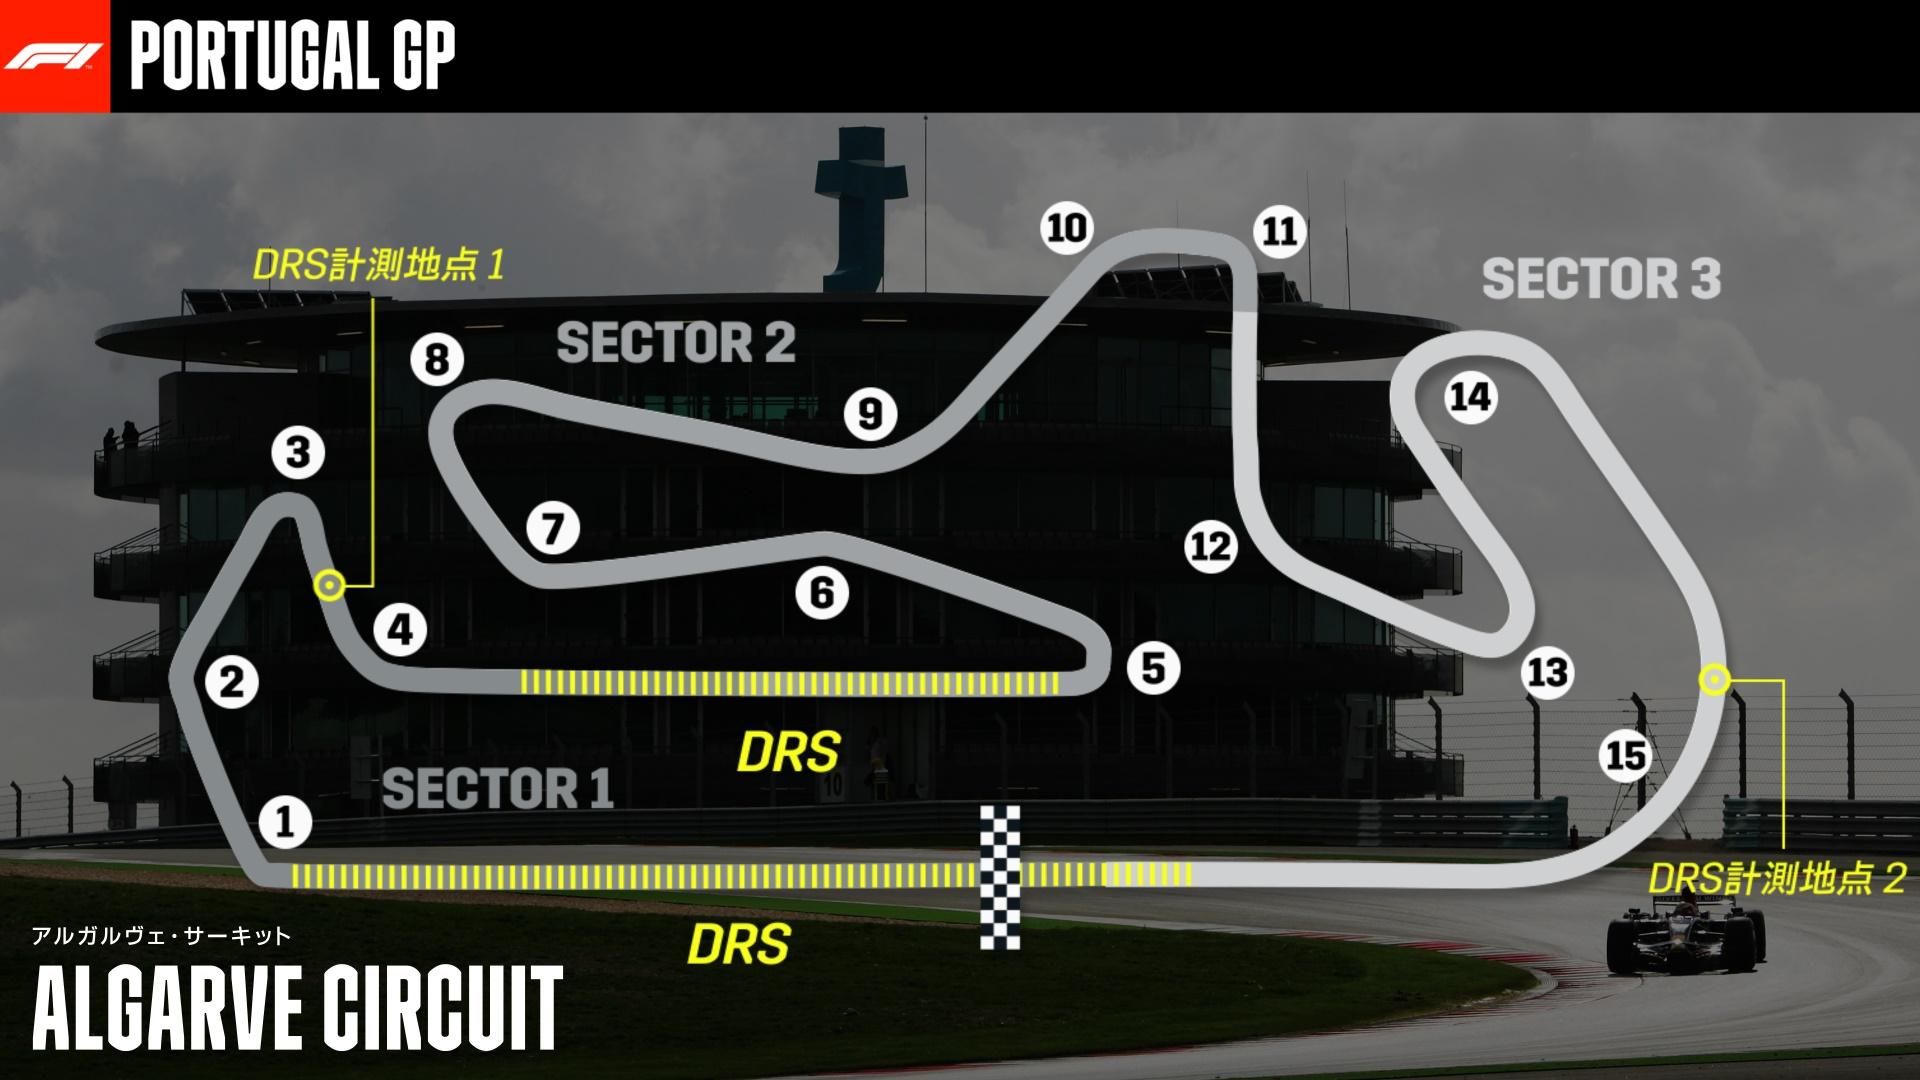 2021-04-28 Portugal circuit Formula 1 F1